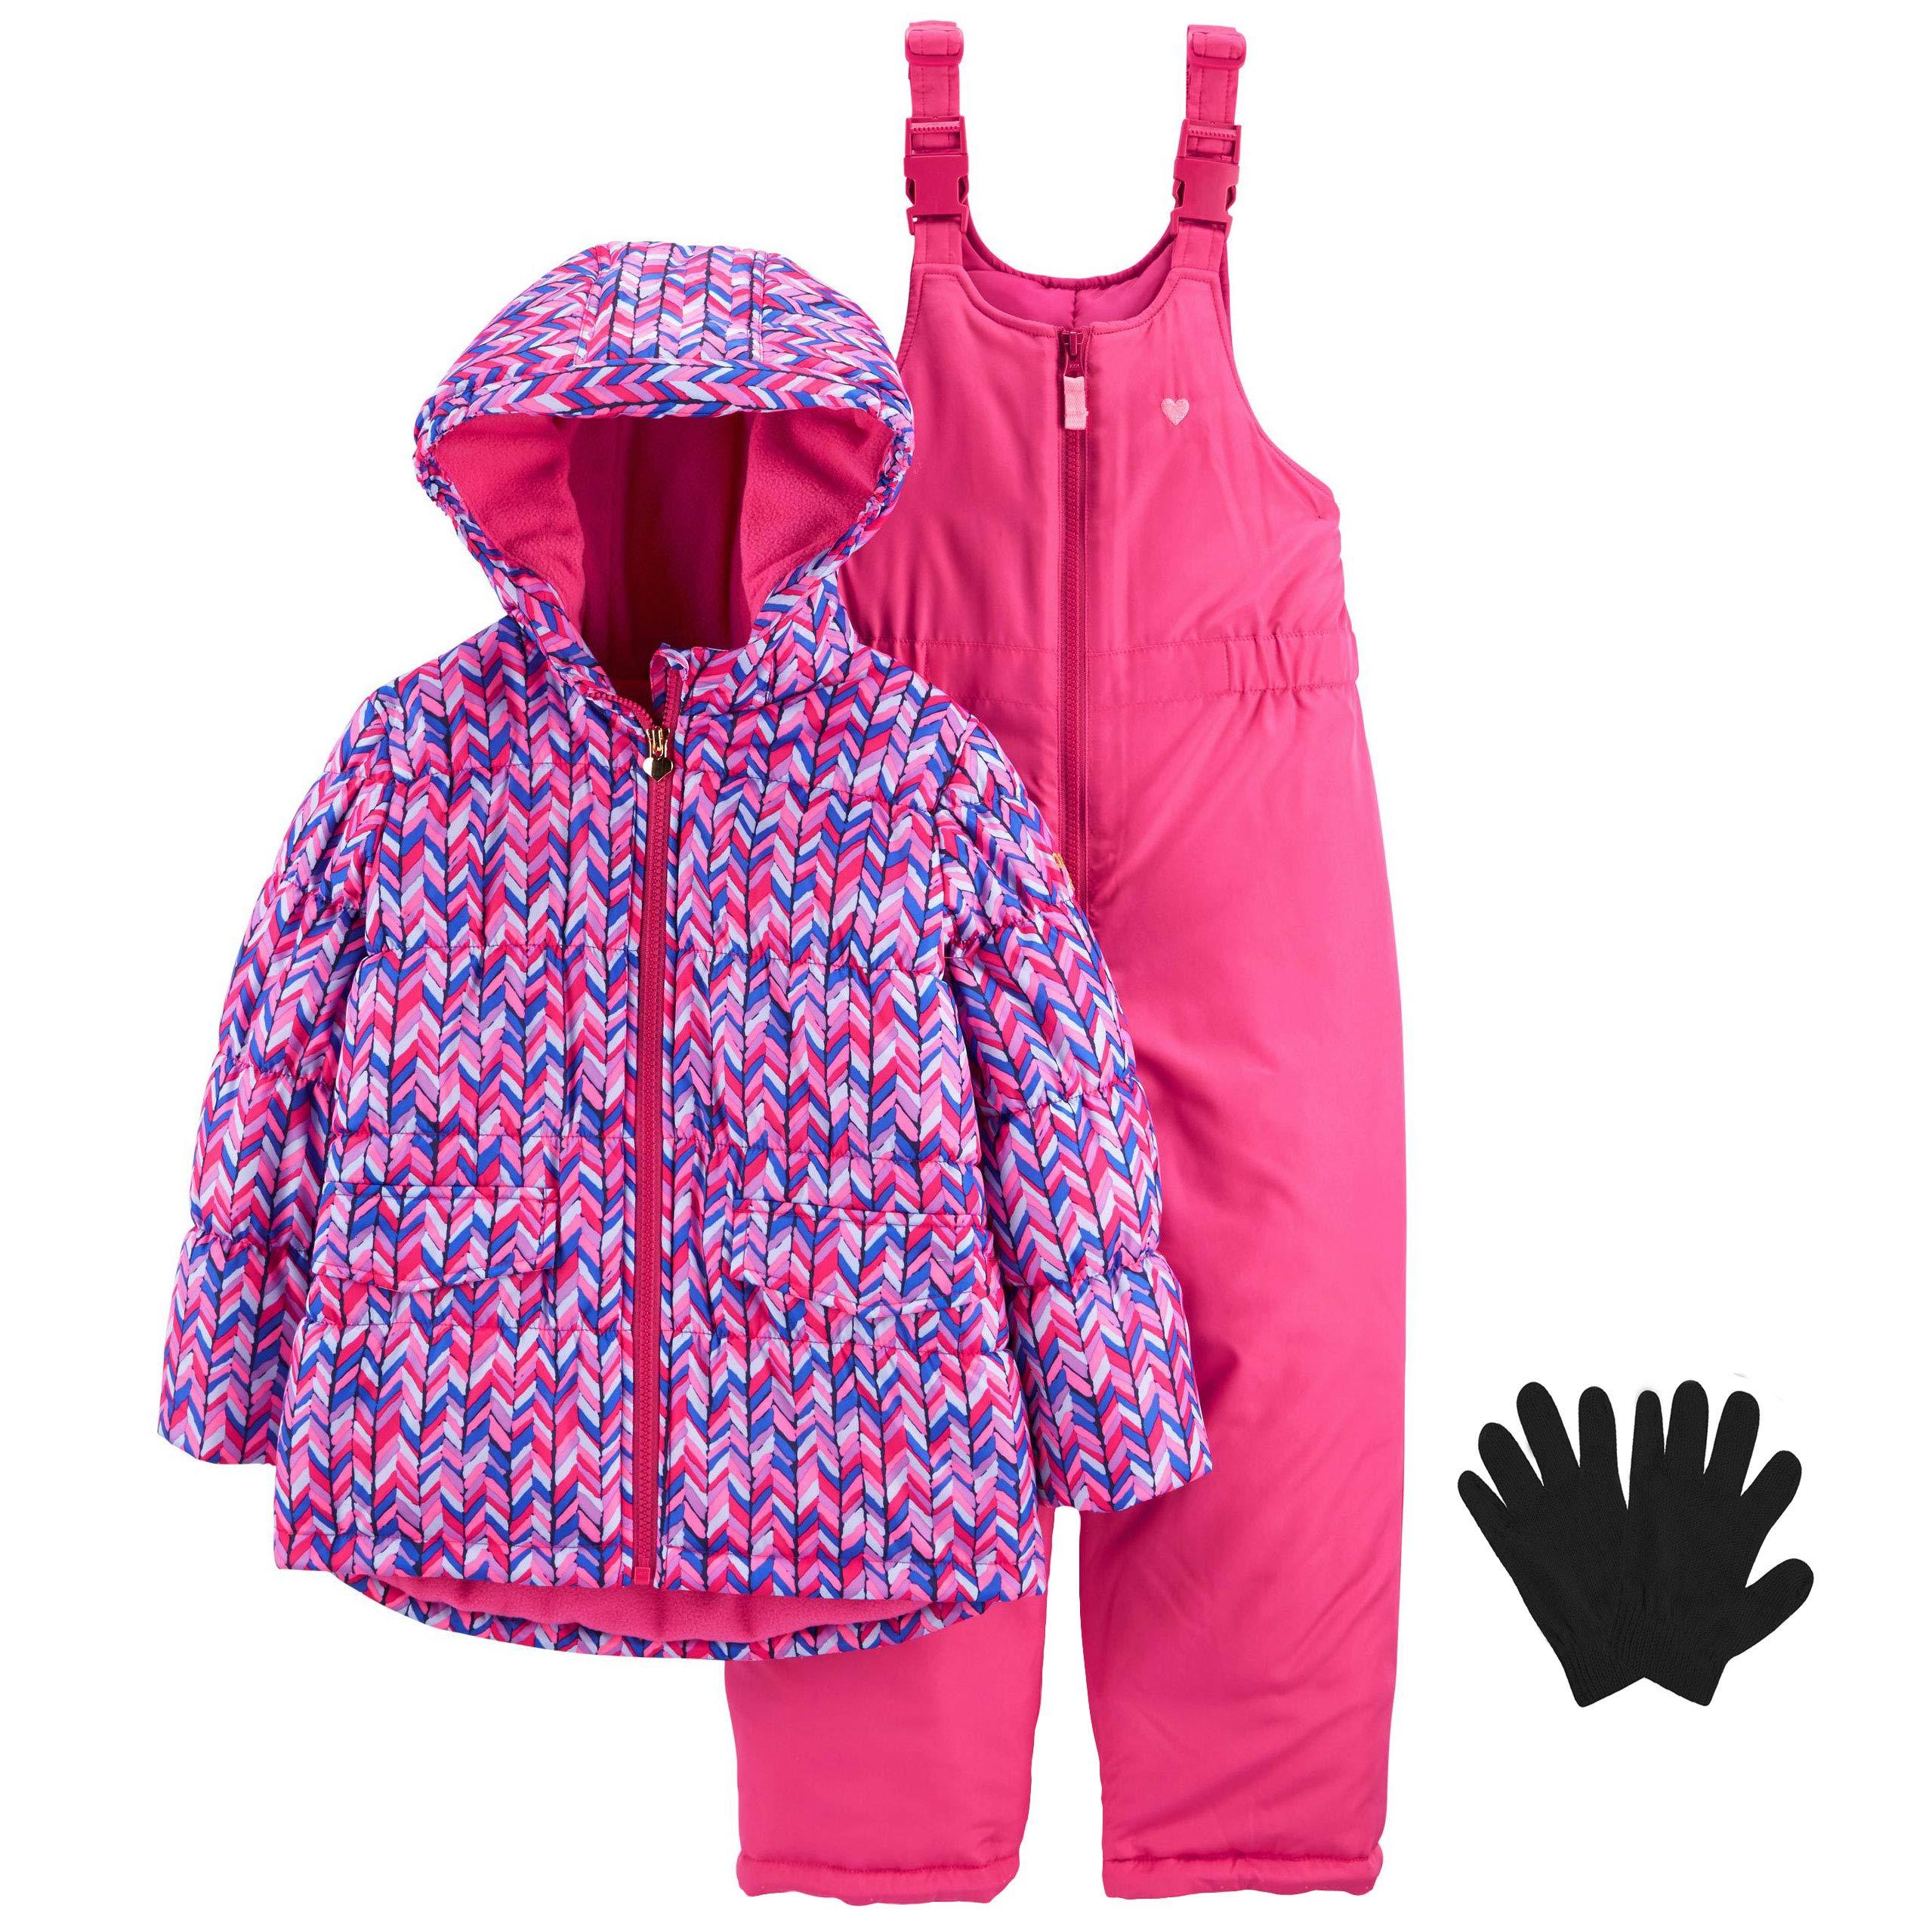 OshKosh Toddler Heavy Weight Jacket (Coat) Snow Pants and Gloves Pink Chevron 4T by OshKosh B'Gosh